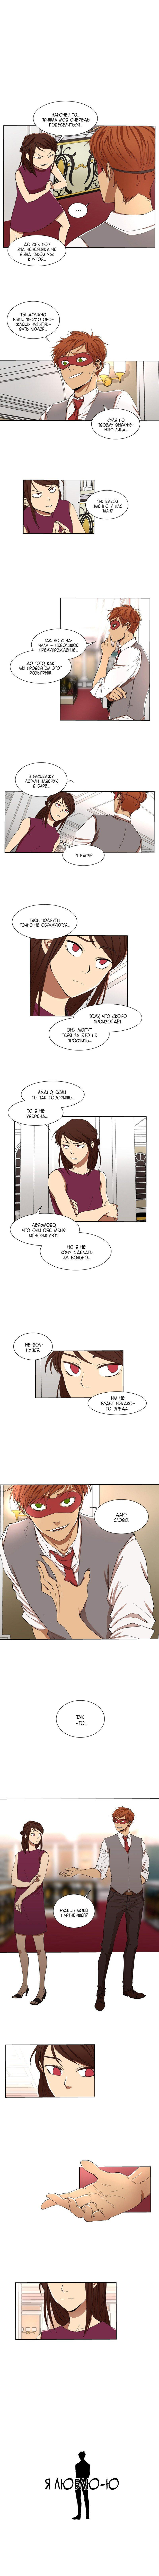 Манга Я люблю Ю / I love Yoo  - Том 1 Глава 5 Страница 2